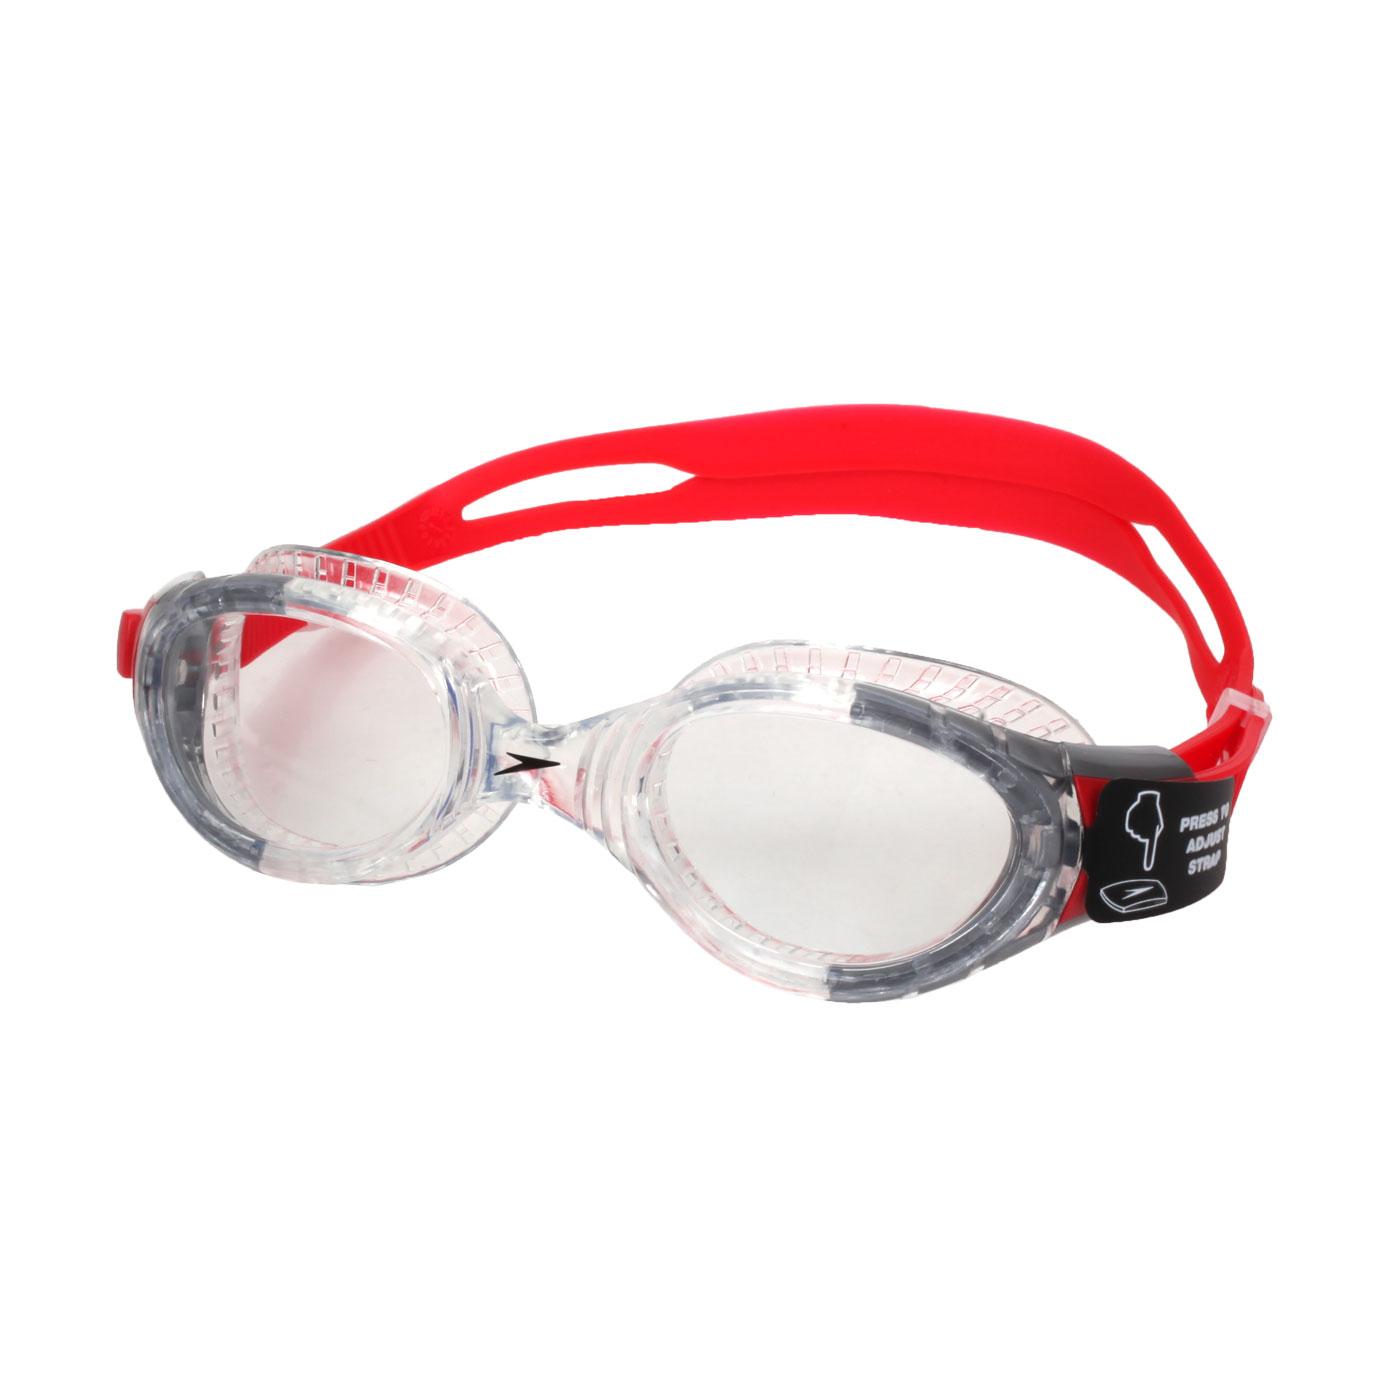 SPEEDO 成人運動泳鏡 Futura Biofuse SD811313B991N